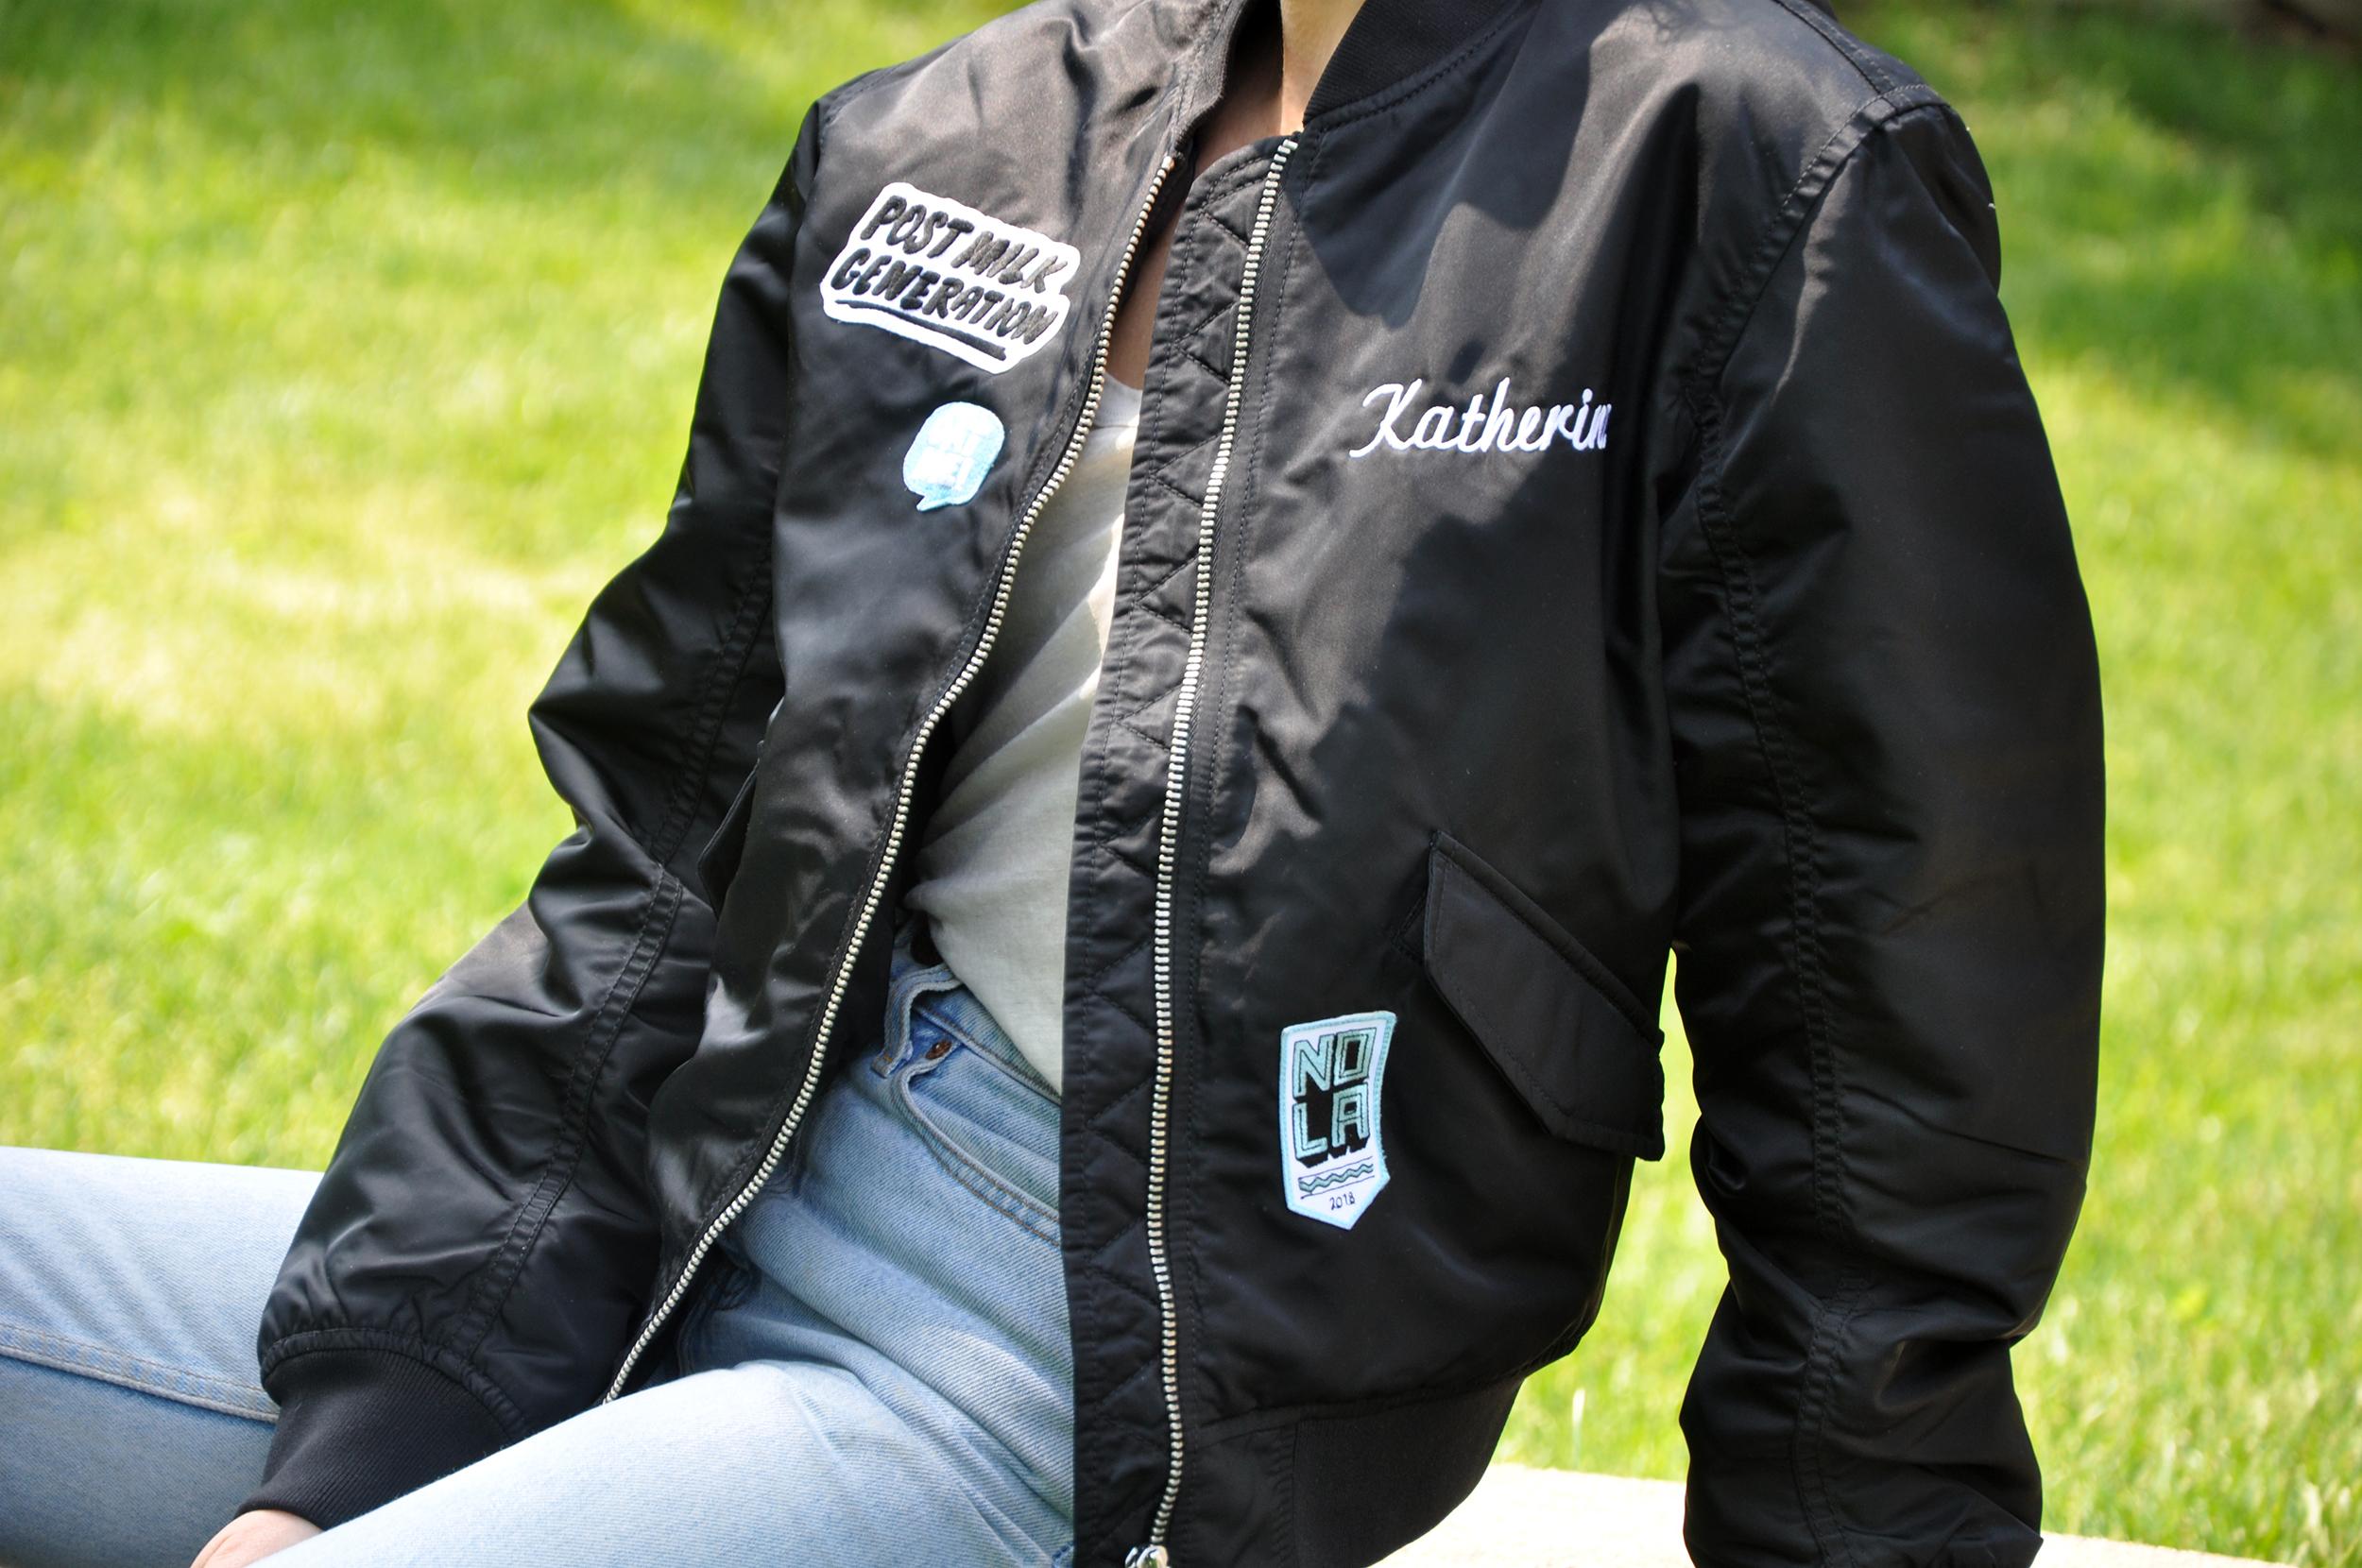 Wearing-jacket-2500.jpg